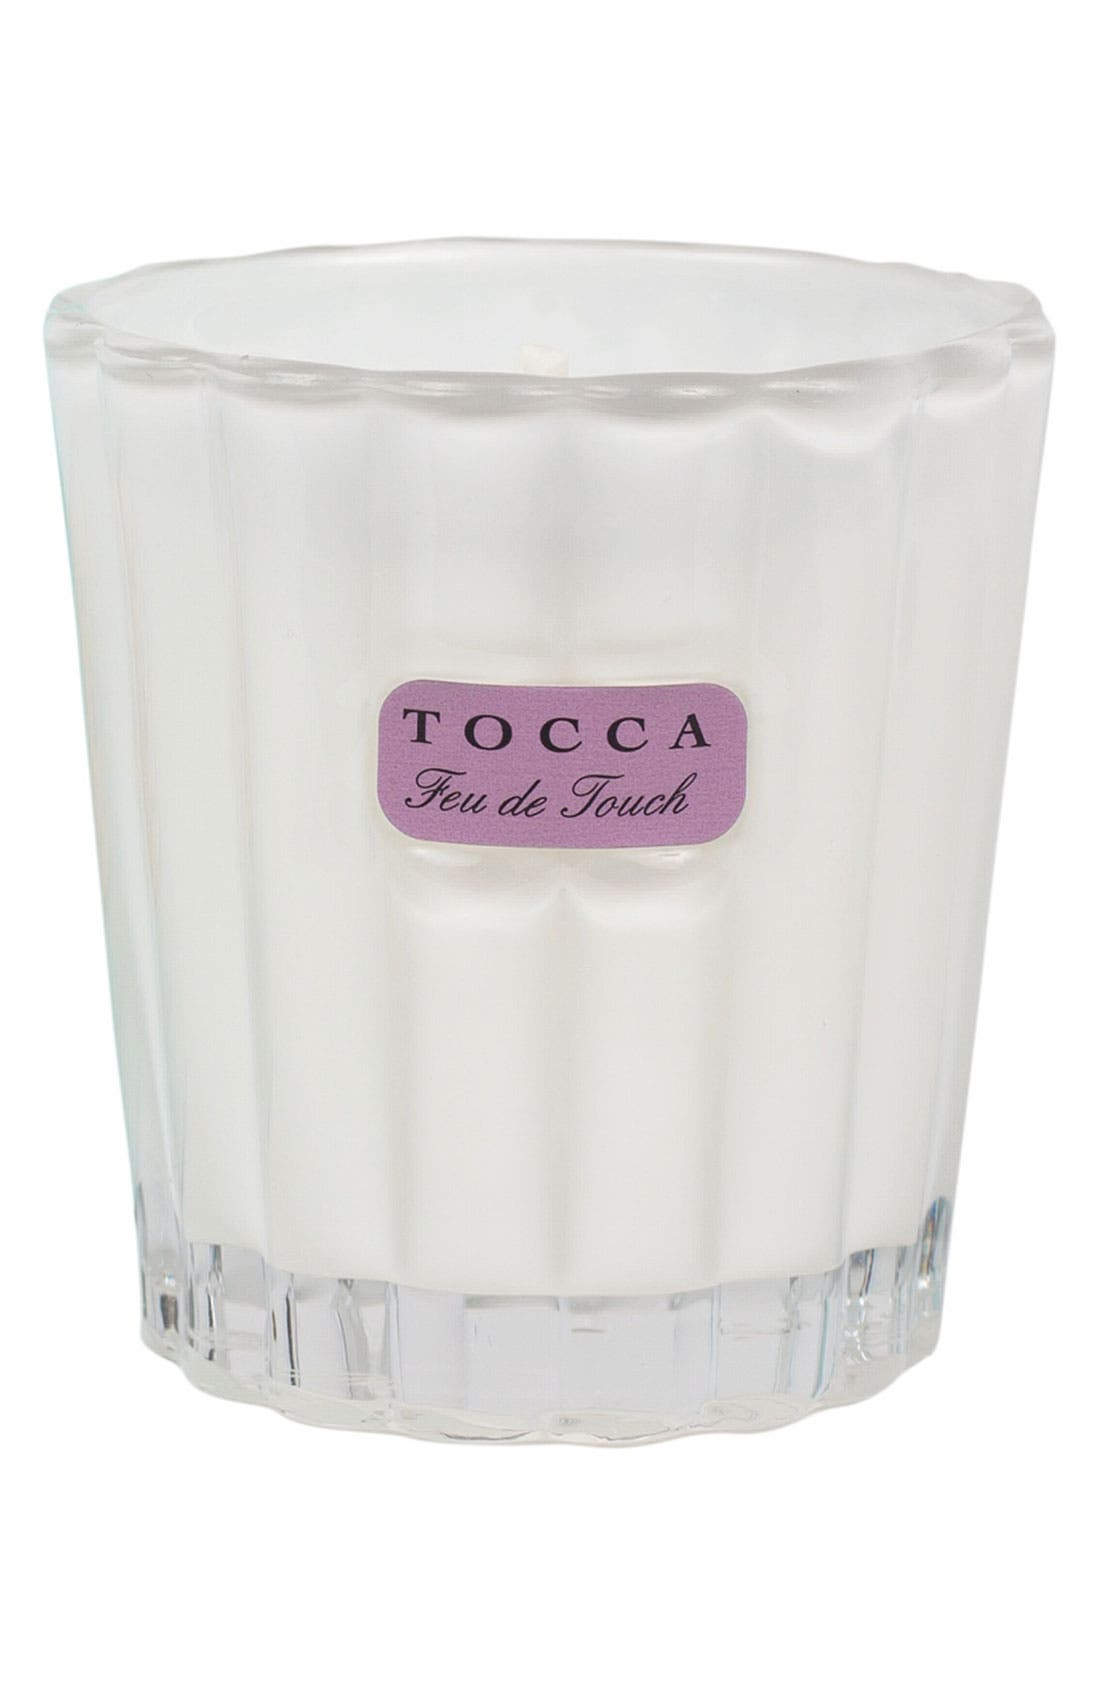 TOCCA 'Feu de Touch' Candelina